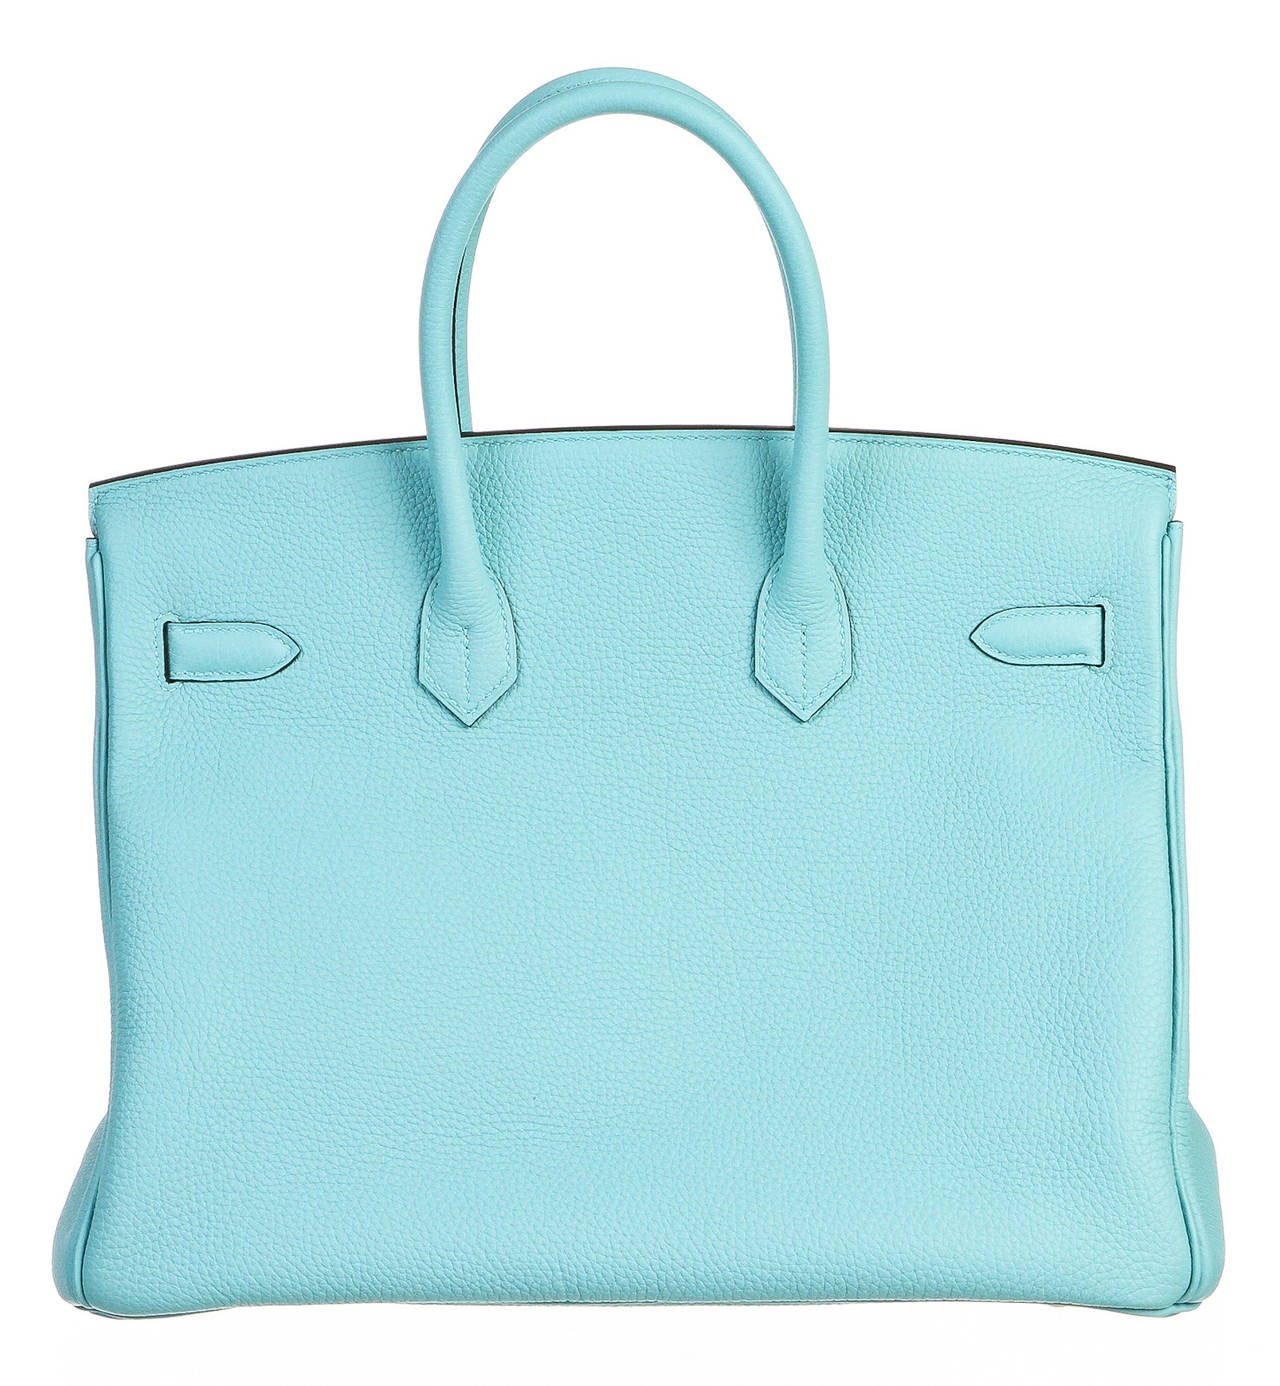 knock off birkin bag - Hermes Blue Atoll 35cm Togo Leather Birkin Handbag GHW at 1stdibs